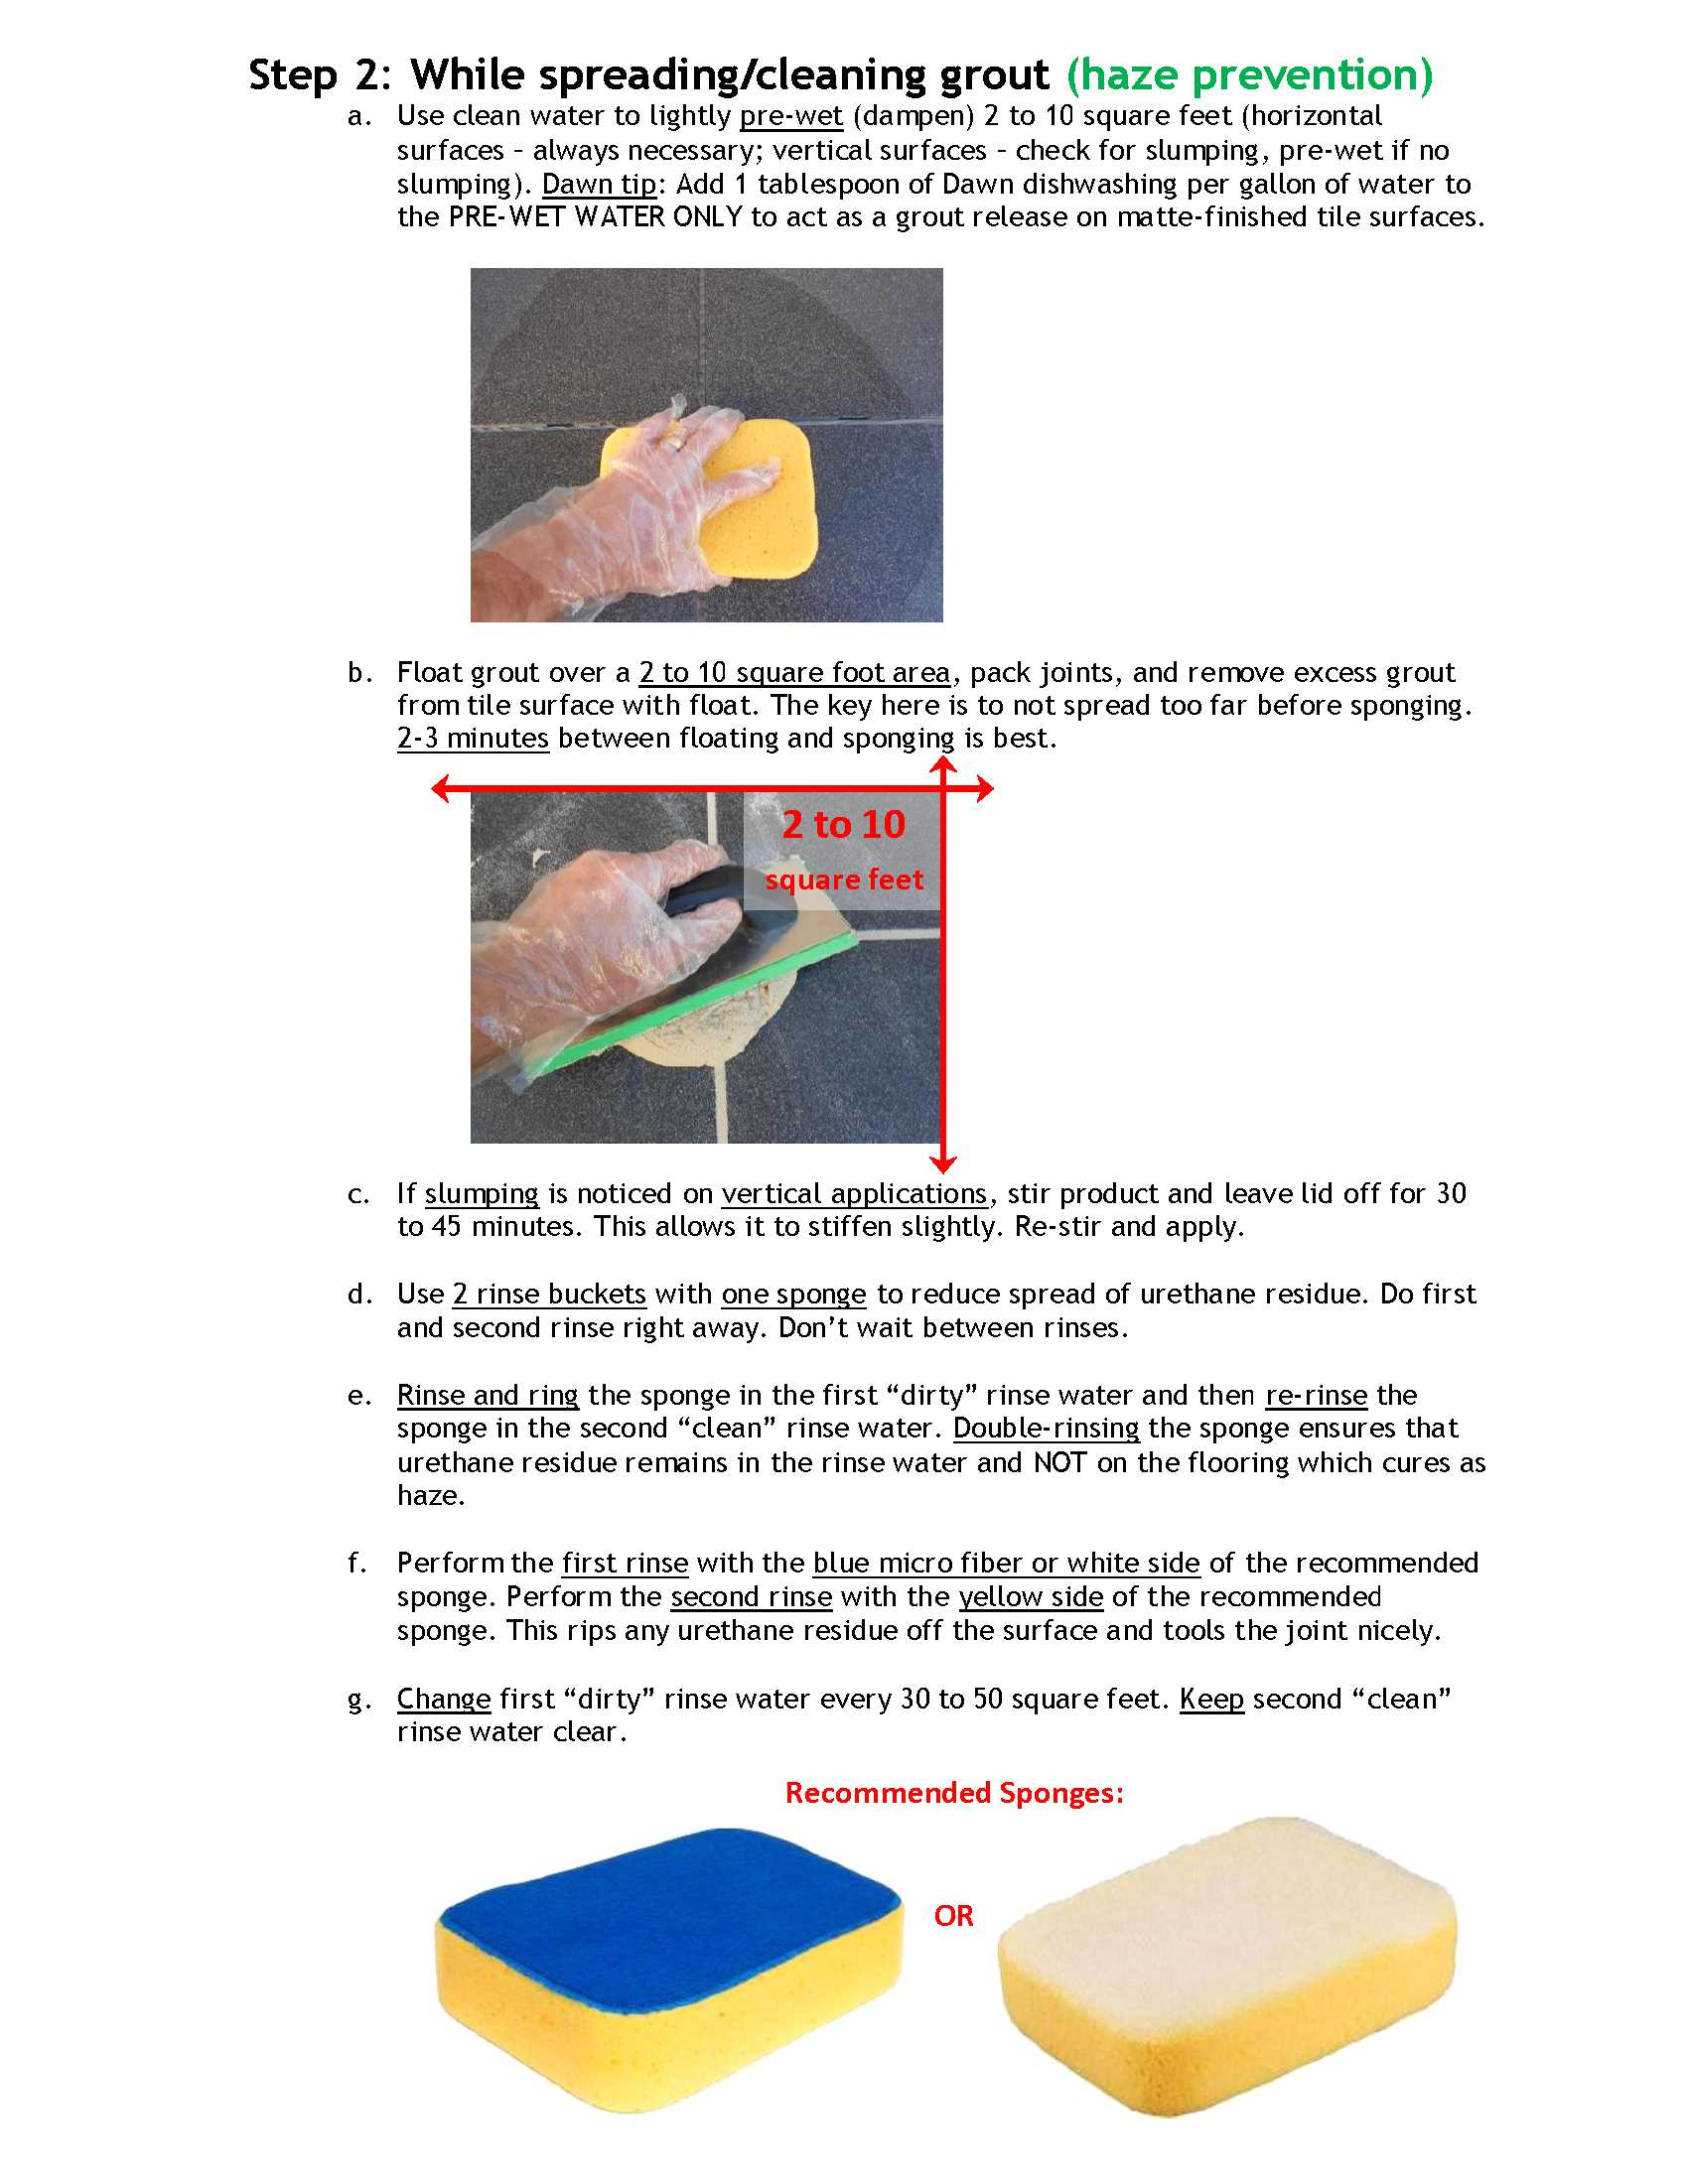 Bostik tile for less utah bostik bostik quartzlock2 urethane grout nvjuhfo Images